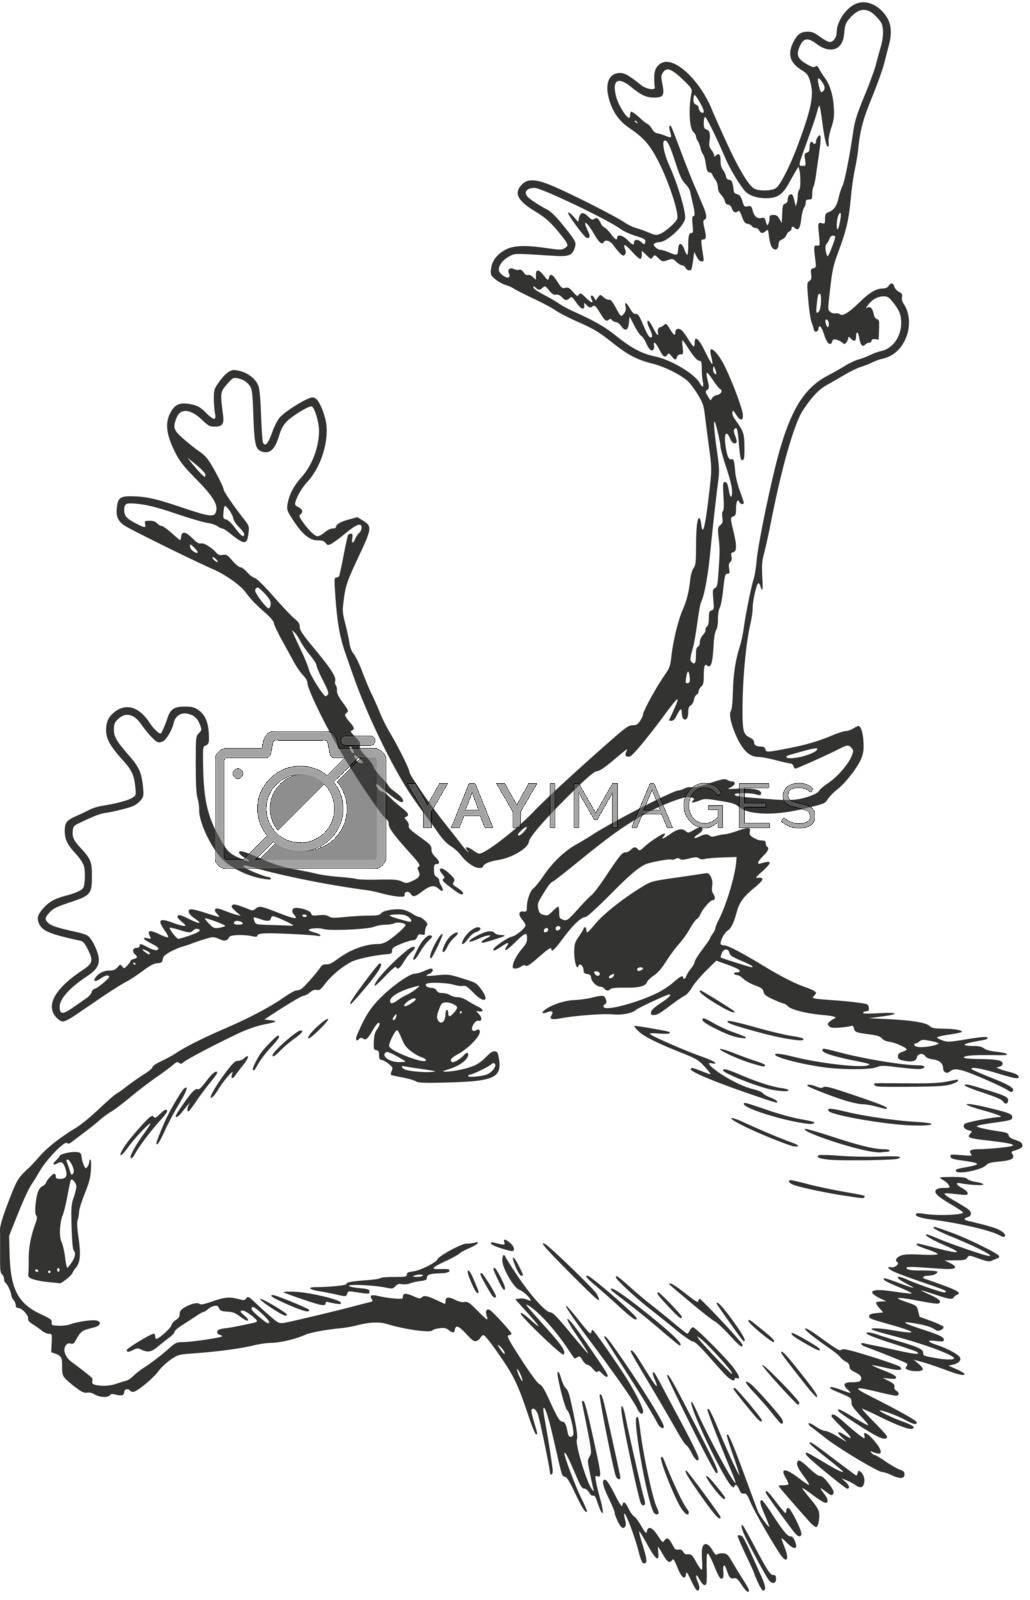 hand drawn, sketch illustration of head of reindeer